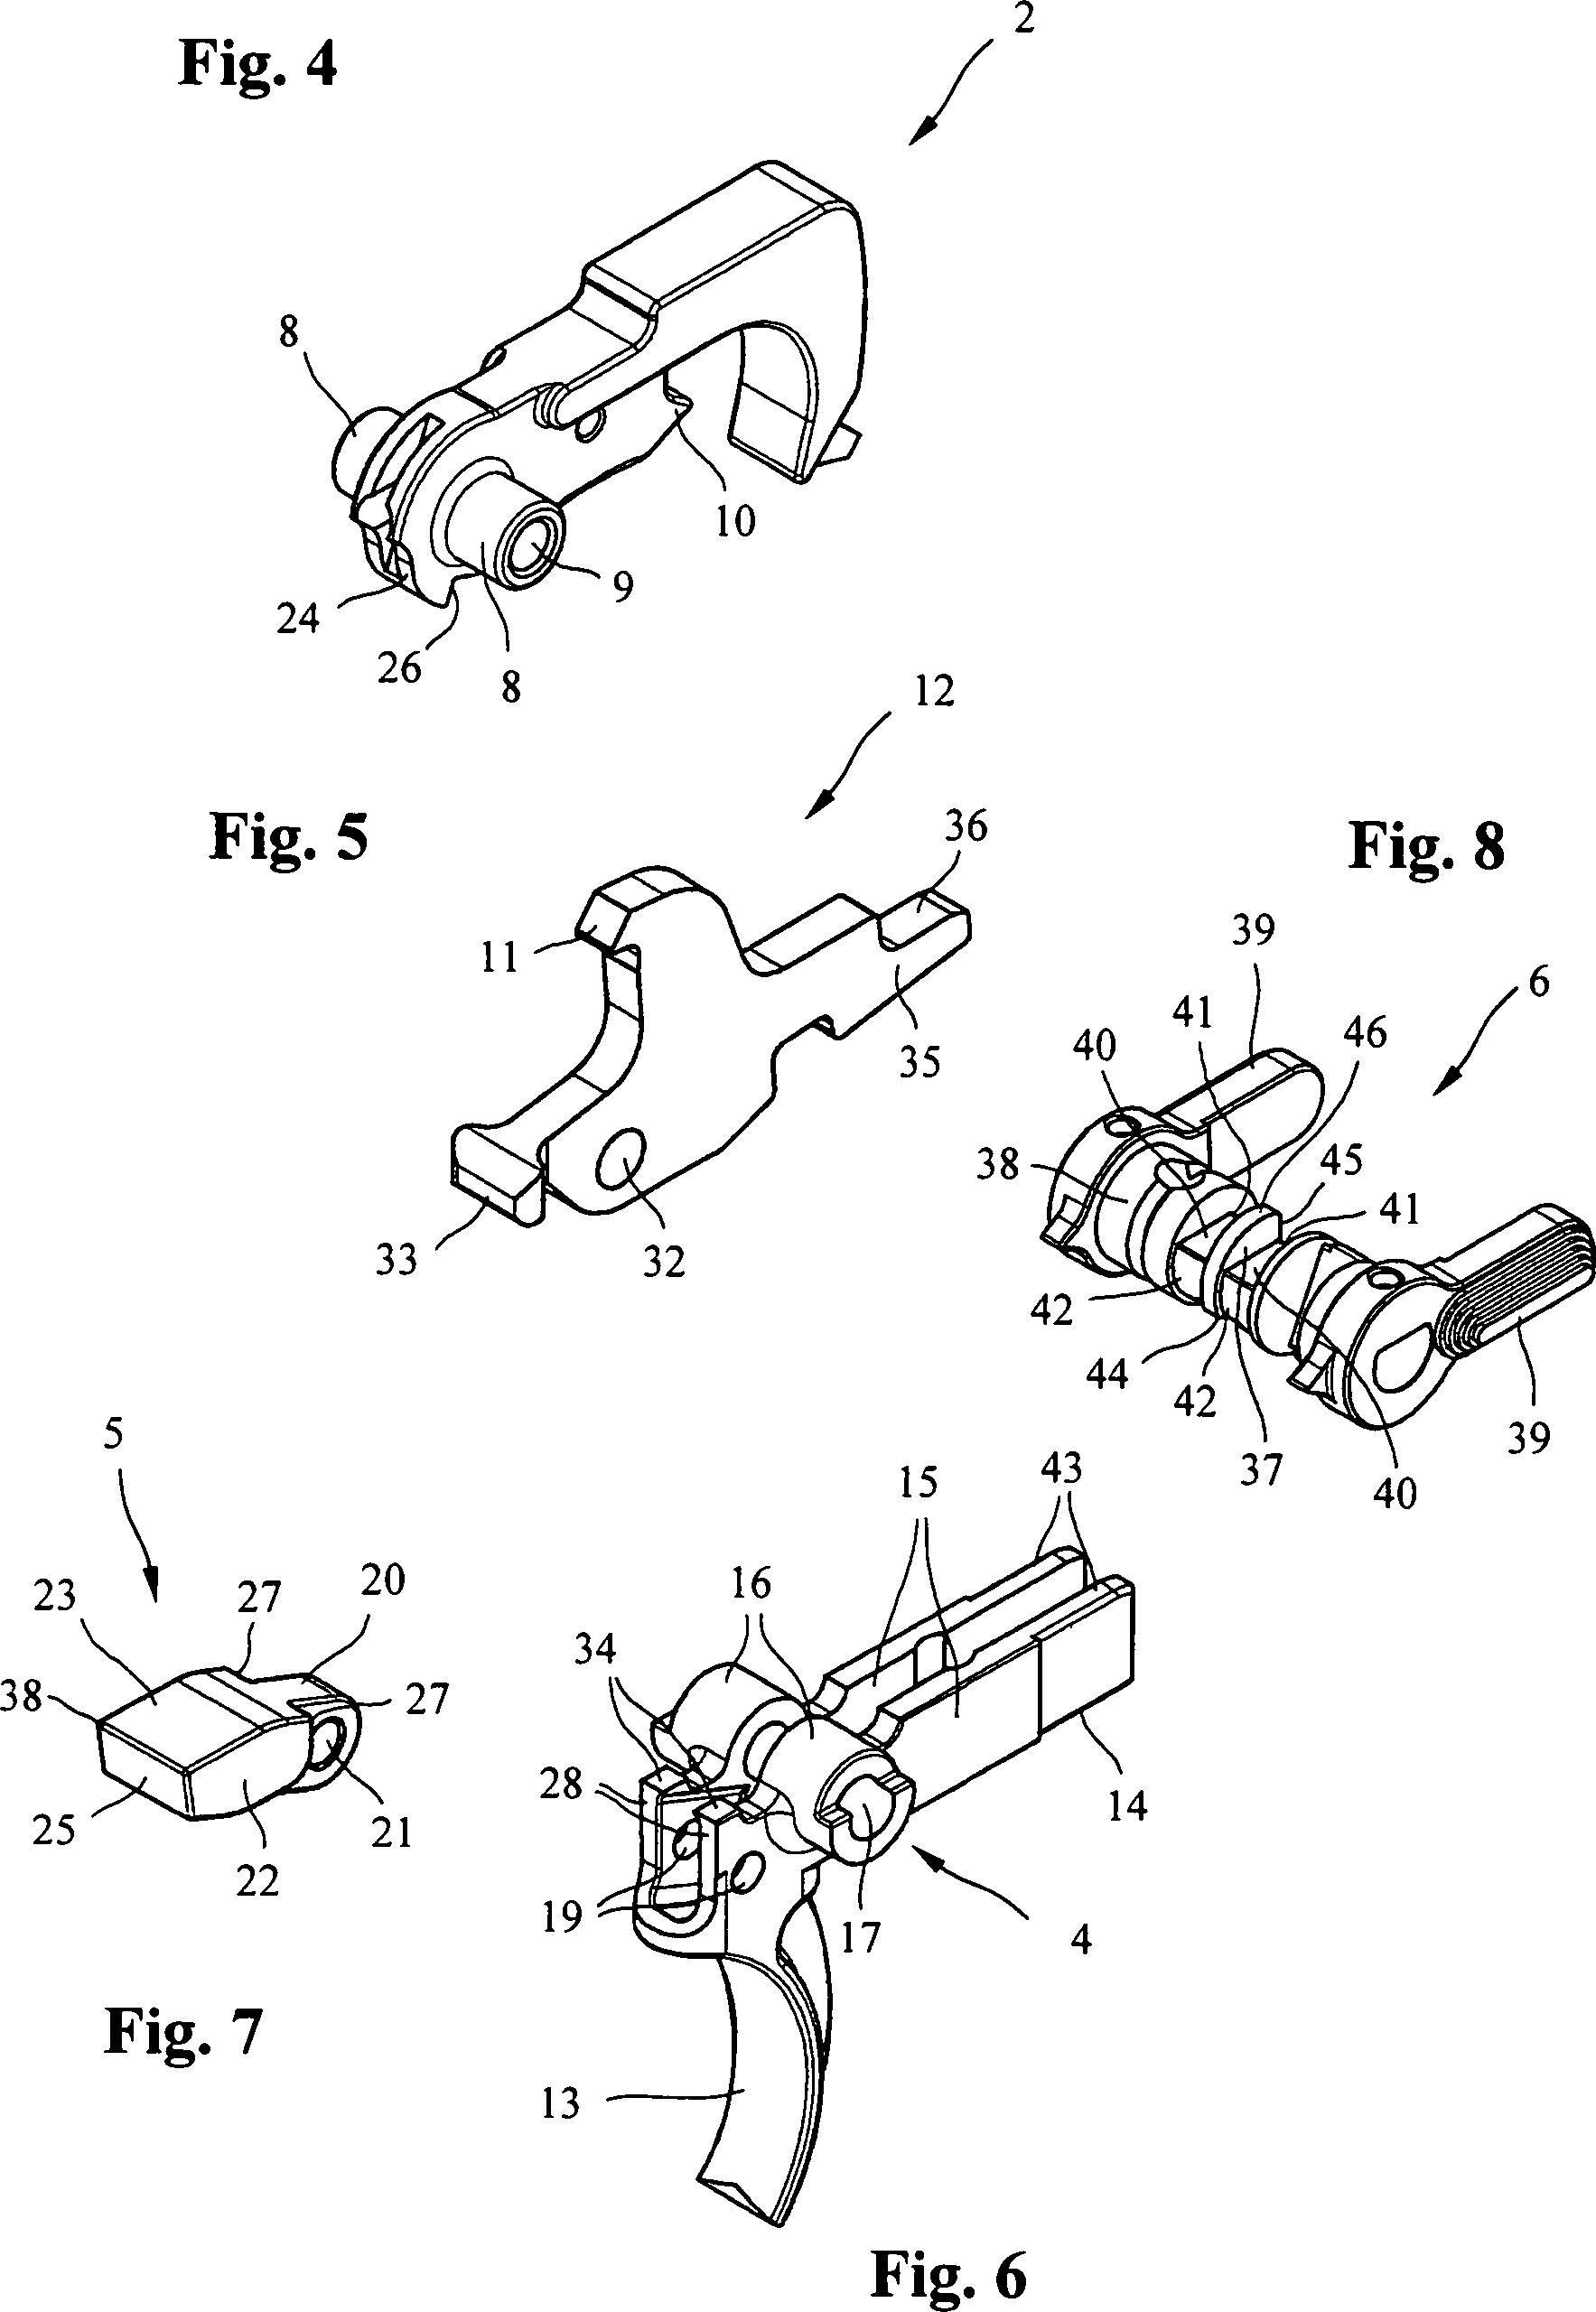 de202011004556u1 trigger mechanism for a handgun google patents [ 1767 x 2560 Pixel ]